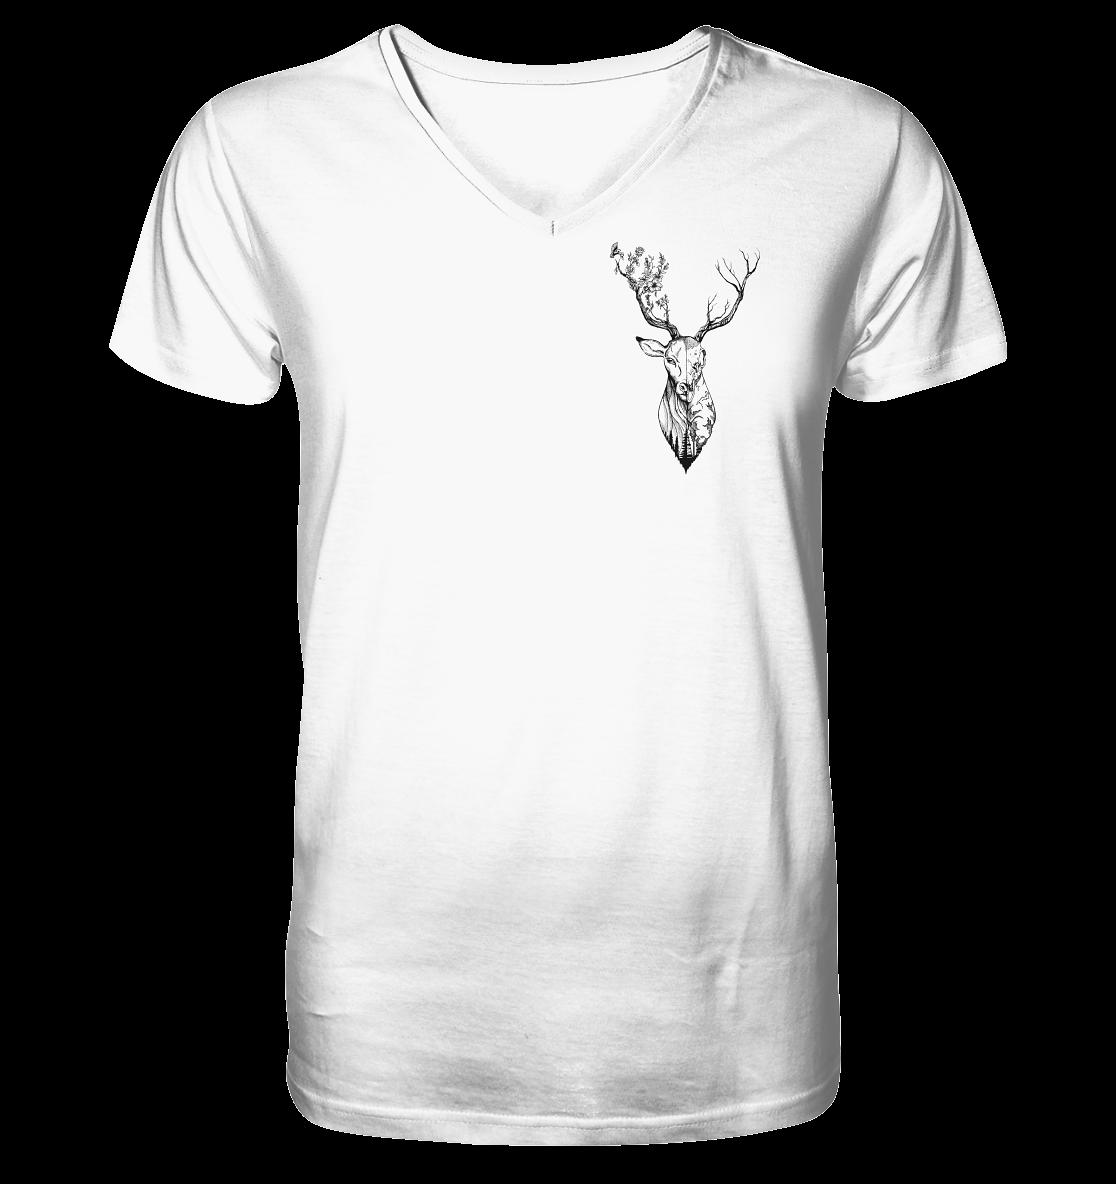 front-mens-organic-v-neck-shirt-f8f8f8-1116x-5.png